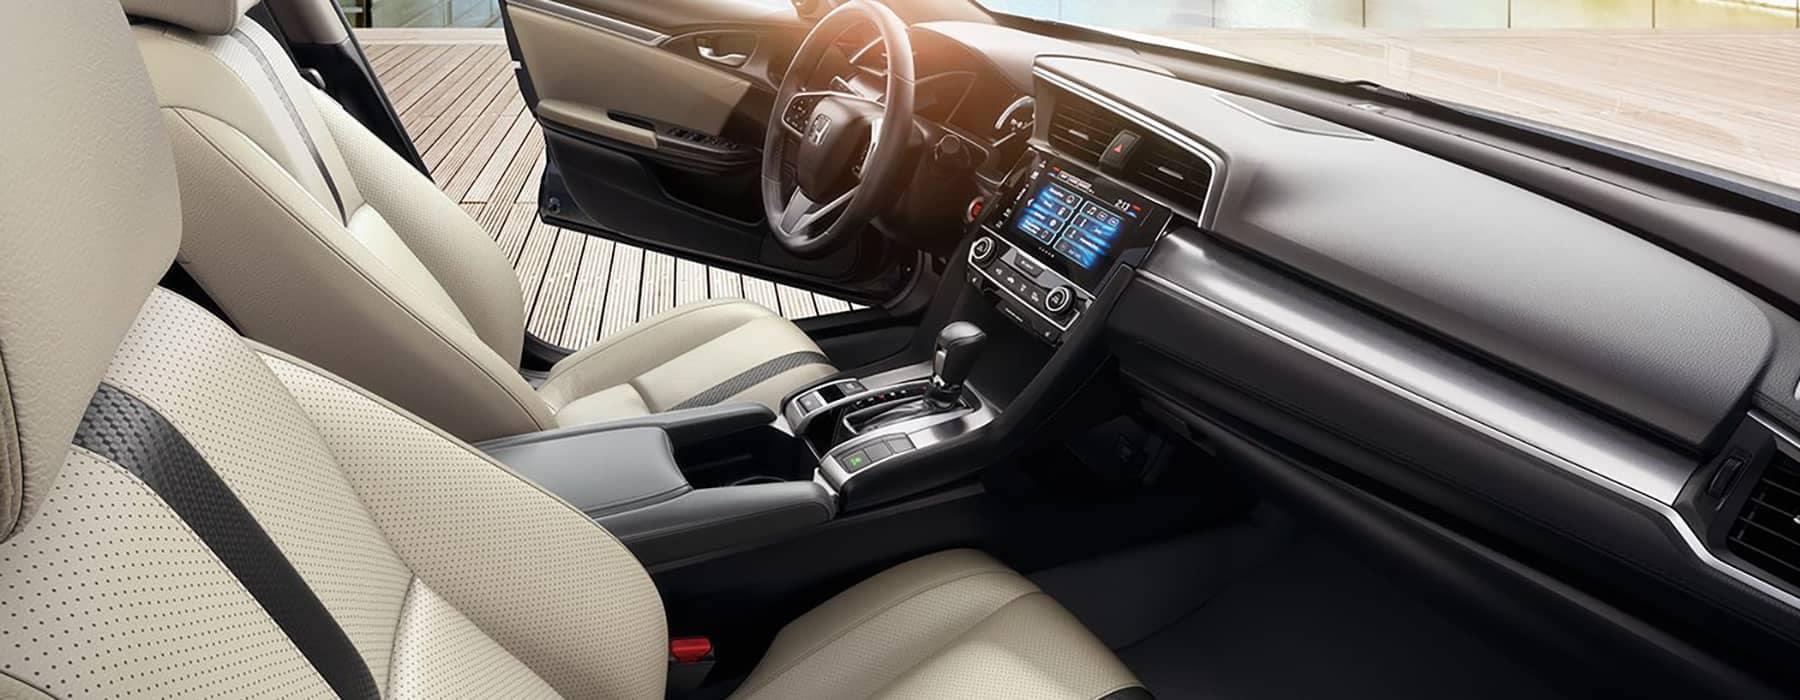 2018 Honda Civic Cabin